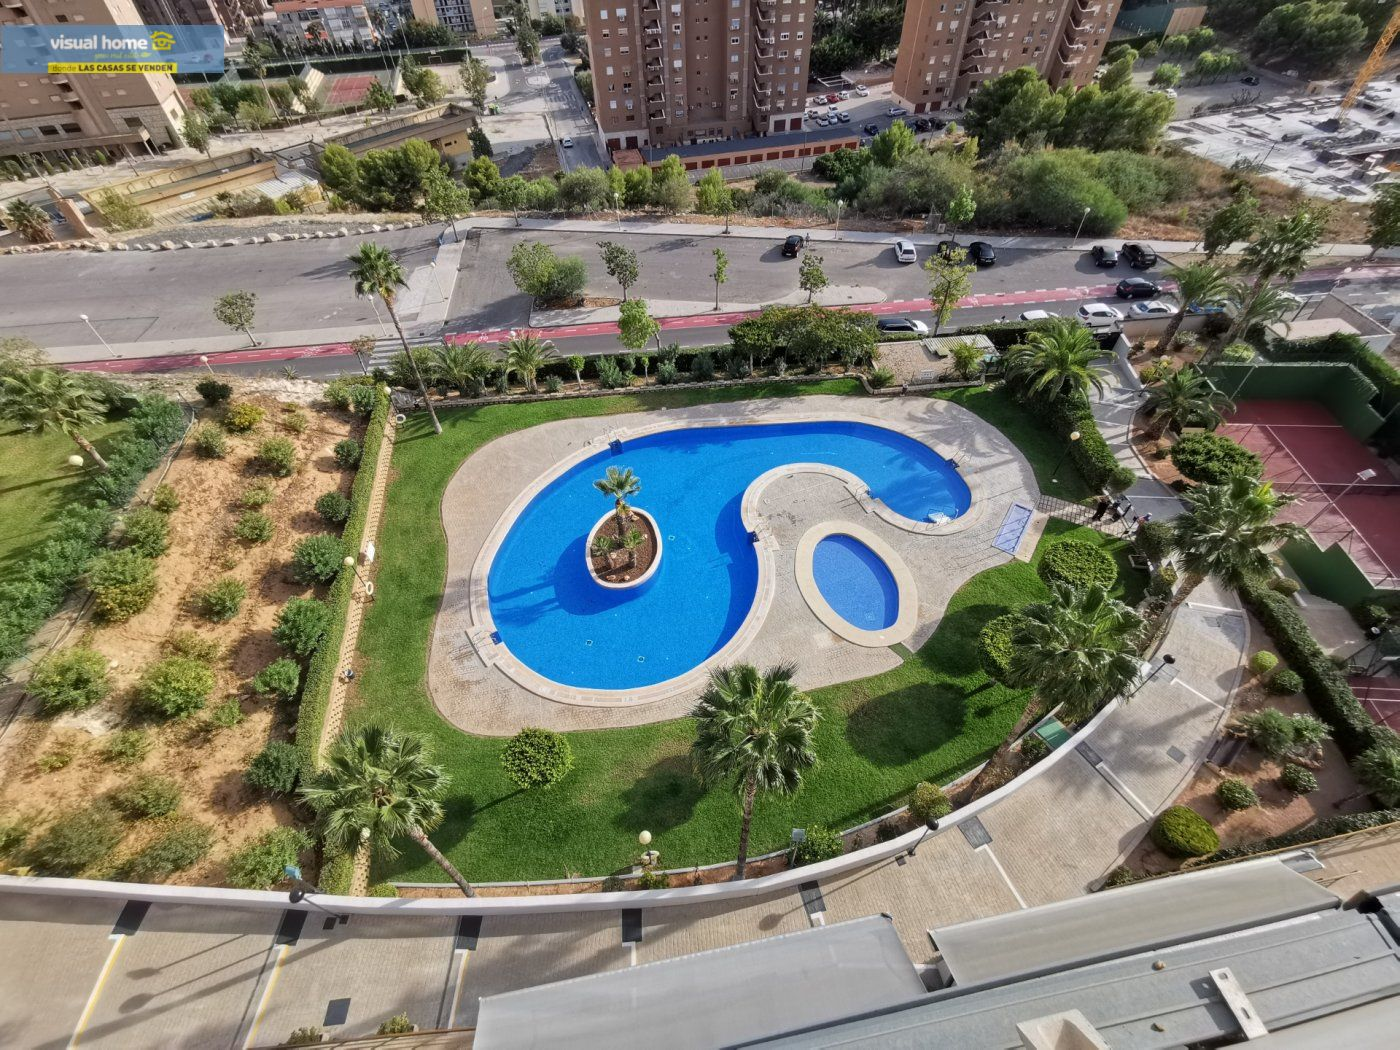 Piso en Benidorm zona Cala de Benidorm de 100 m²